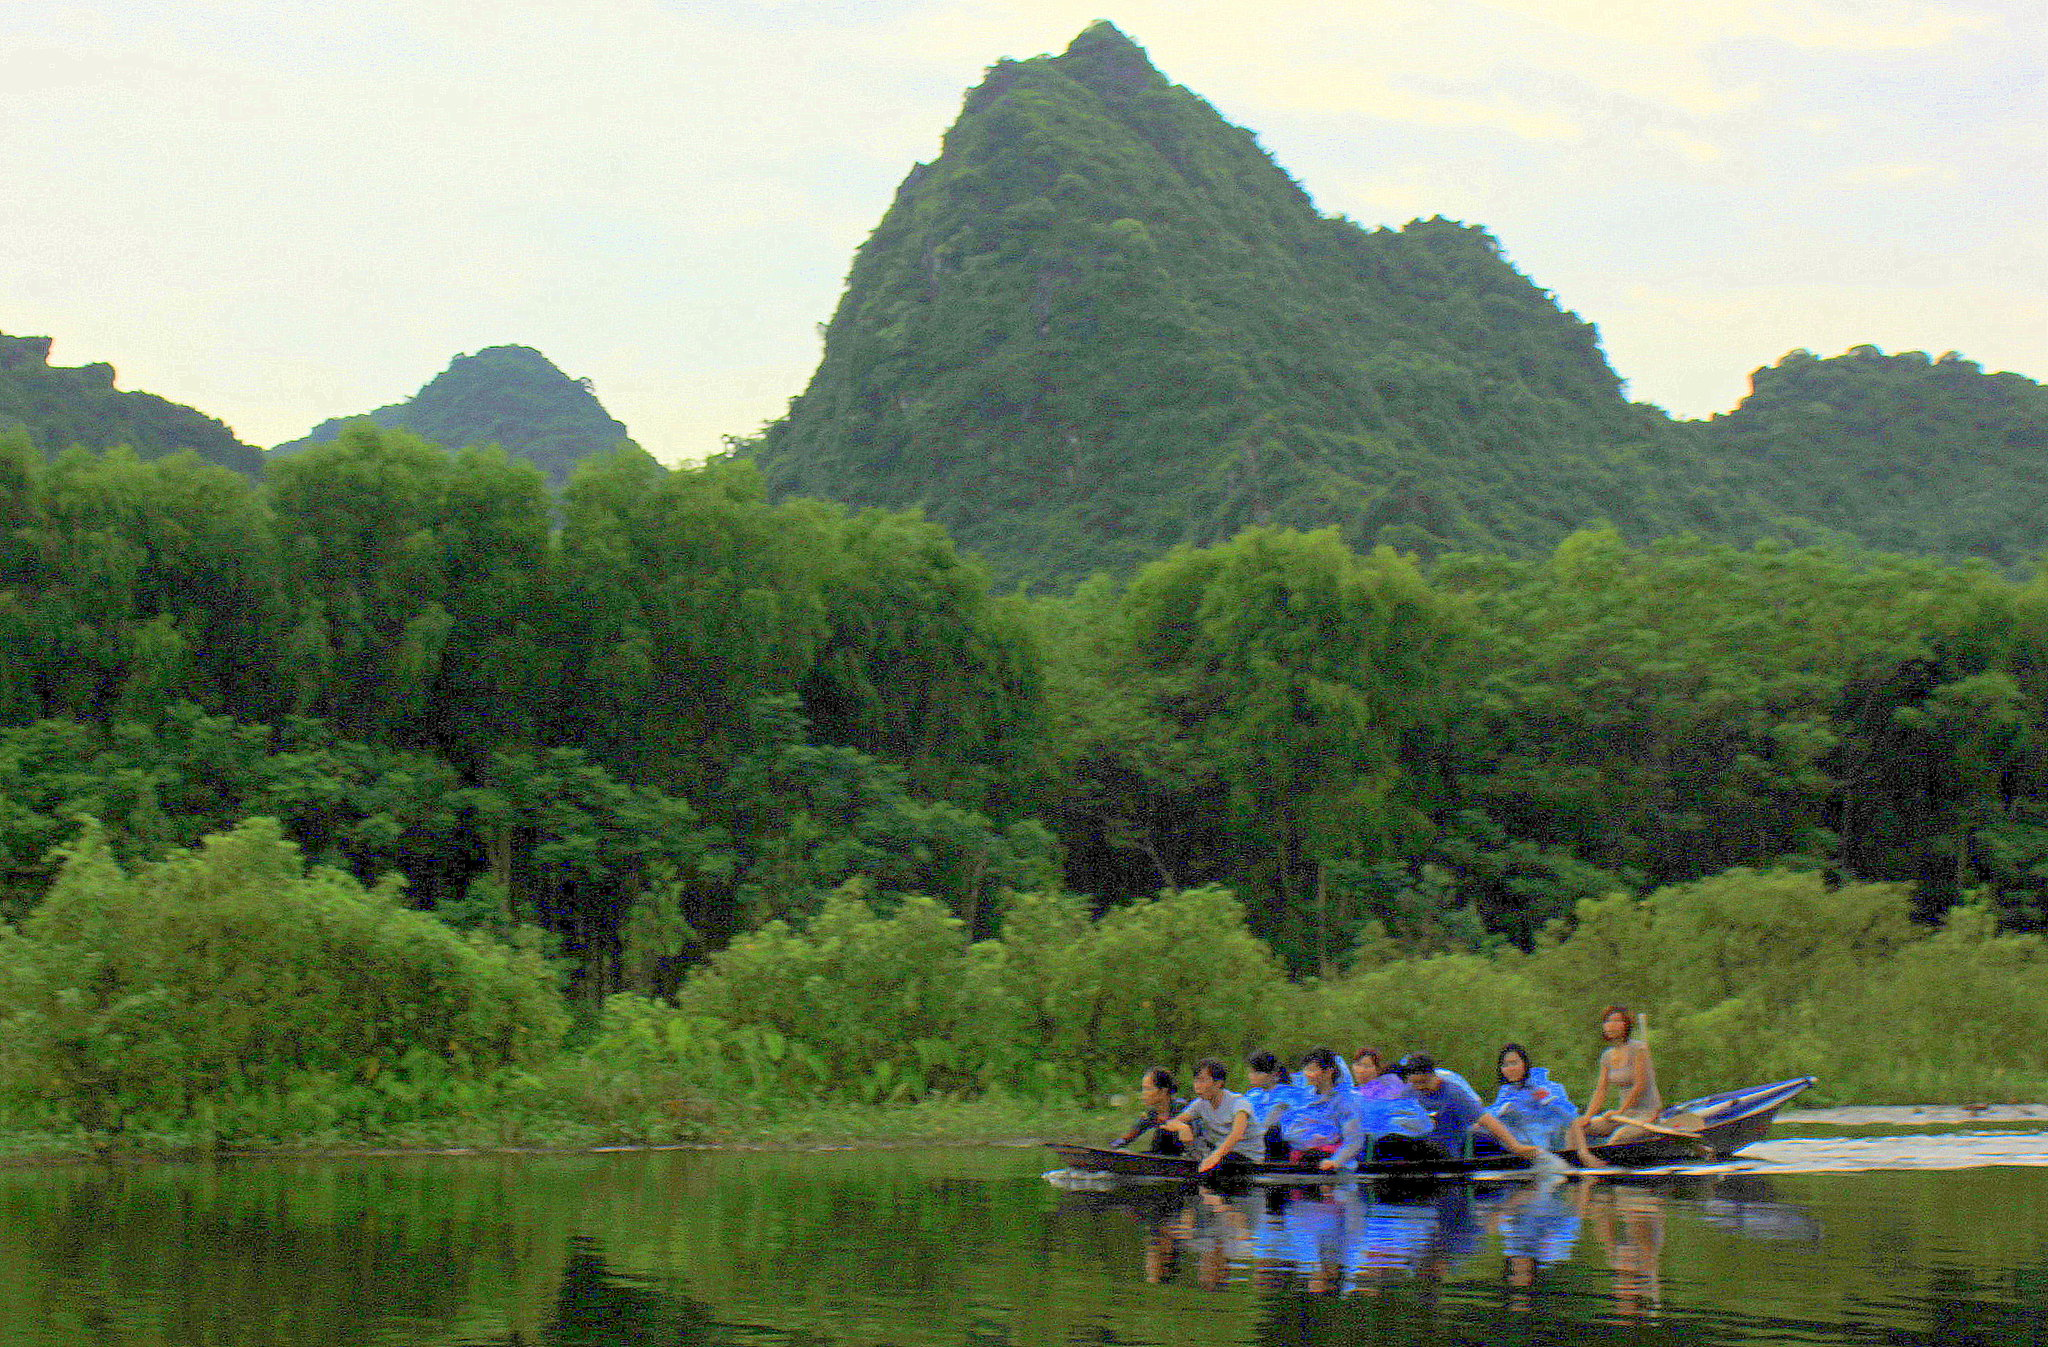 A scenic boat ride to Perfume Pagoda